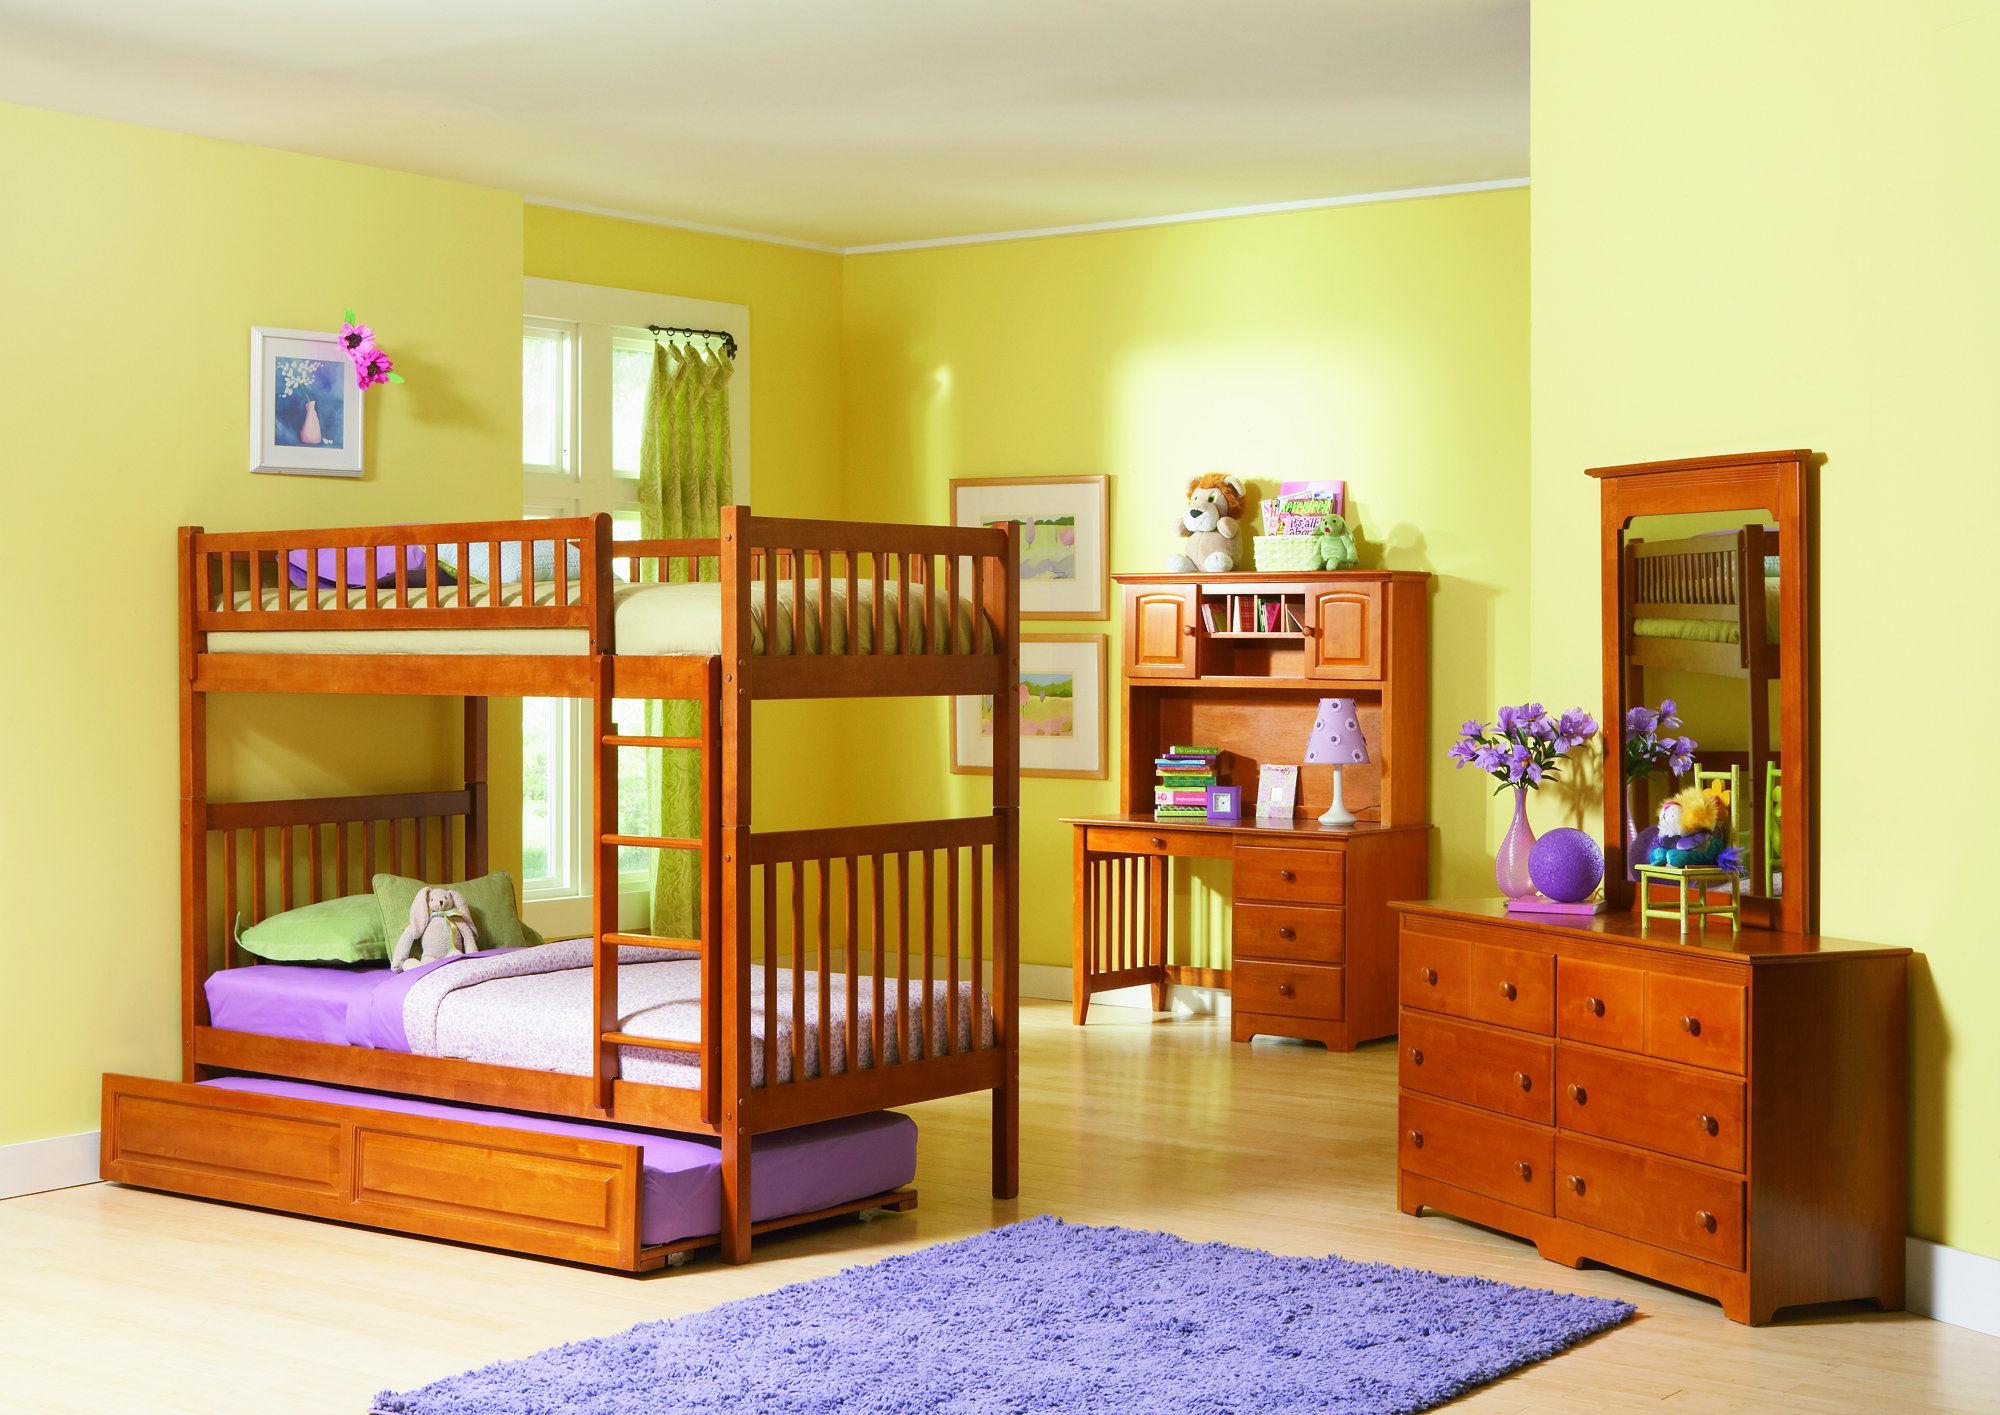 Full size nursery furniture of the bedroom kids white bedroom suite cute little girls bedroom TOKLLAJ